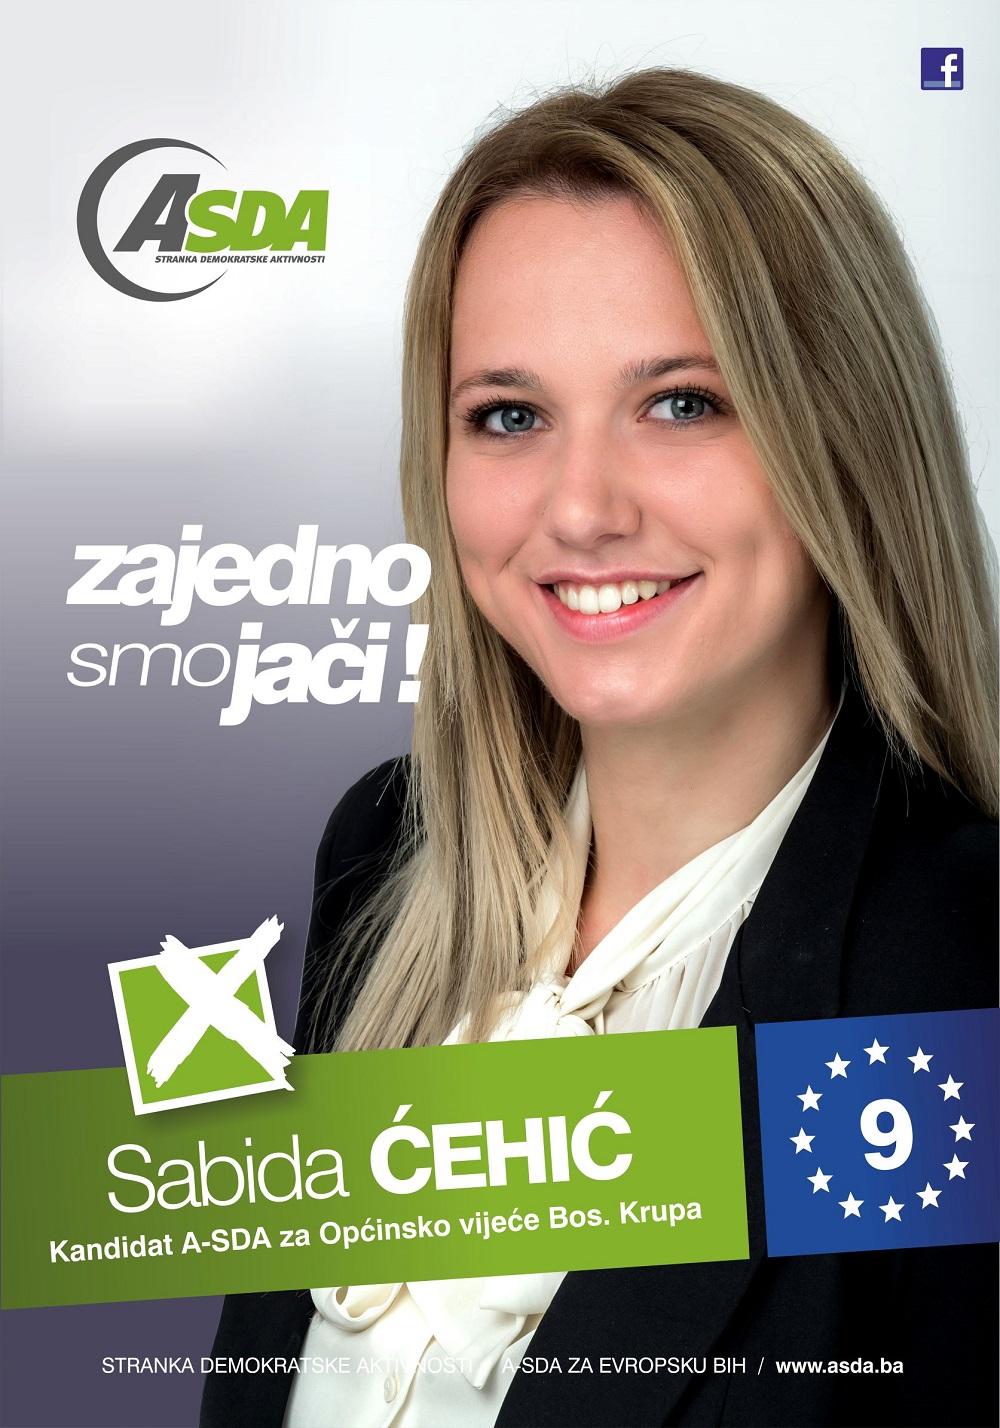 Sabida Ćehić